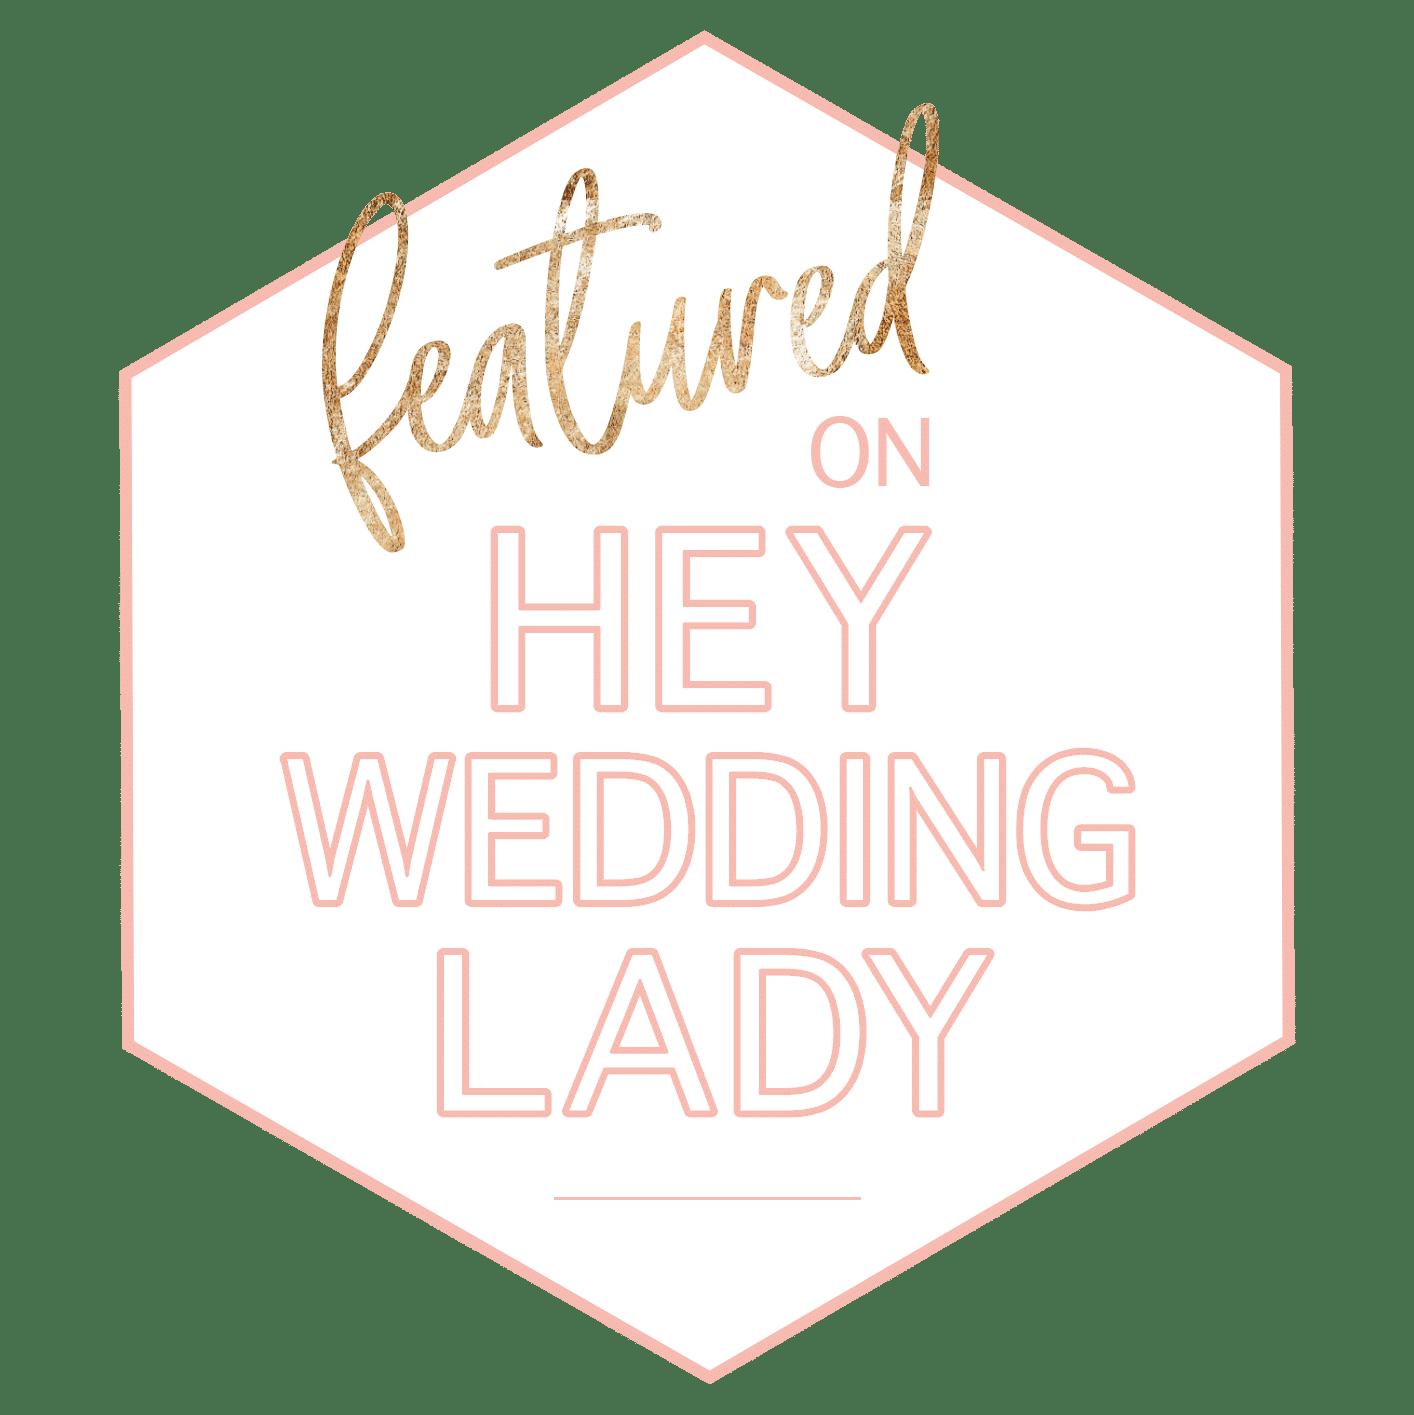 Featured on Hey Wedding LadY